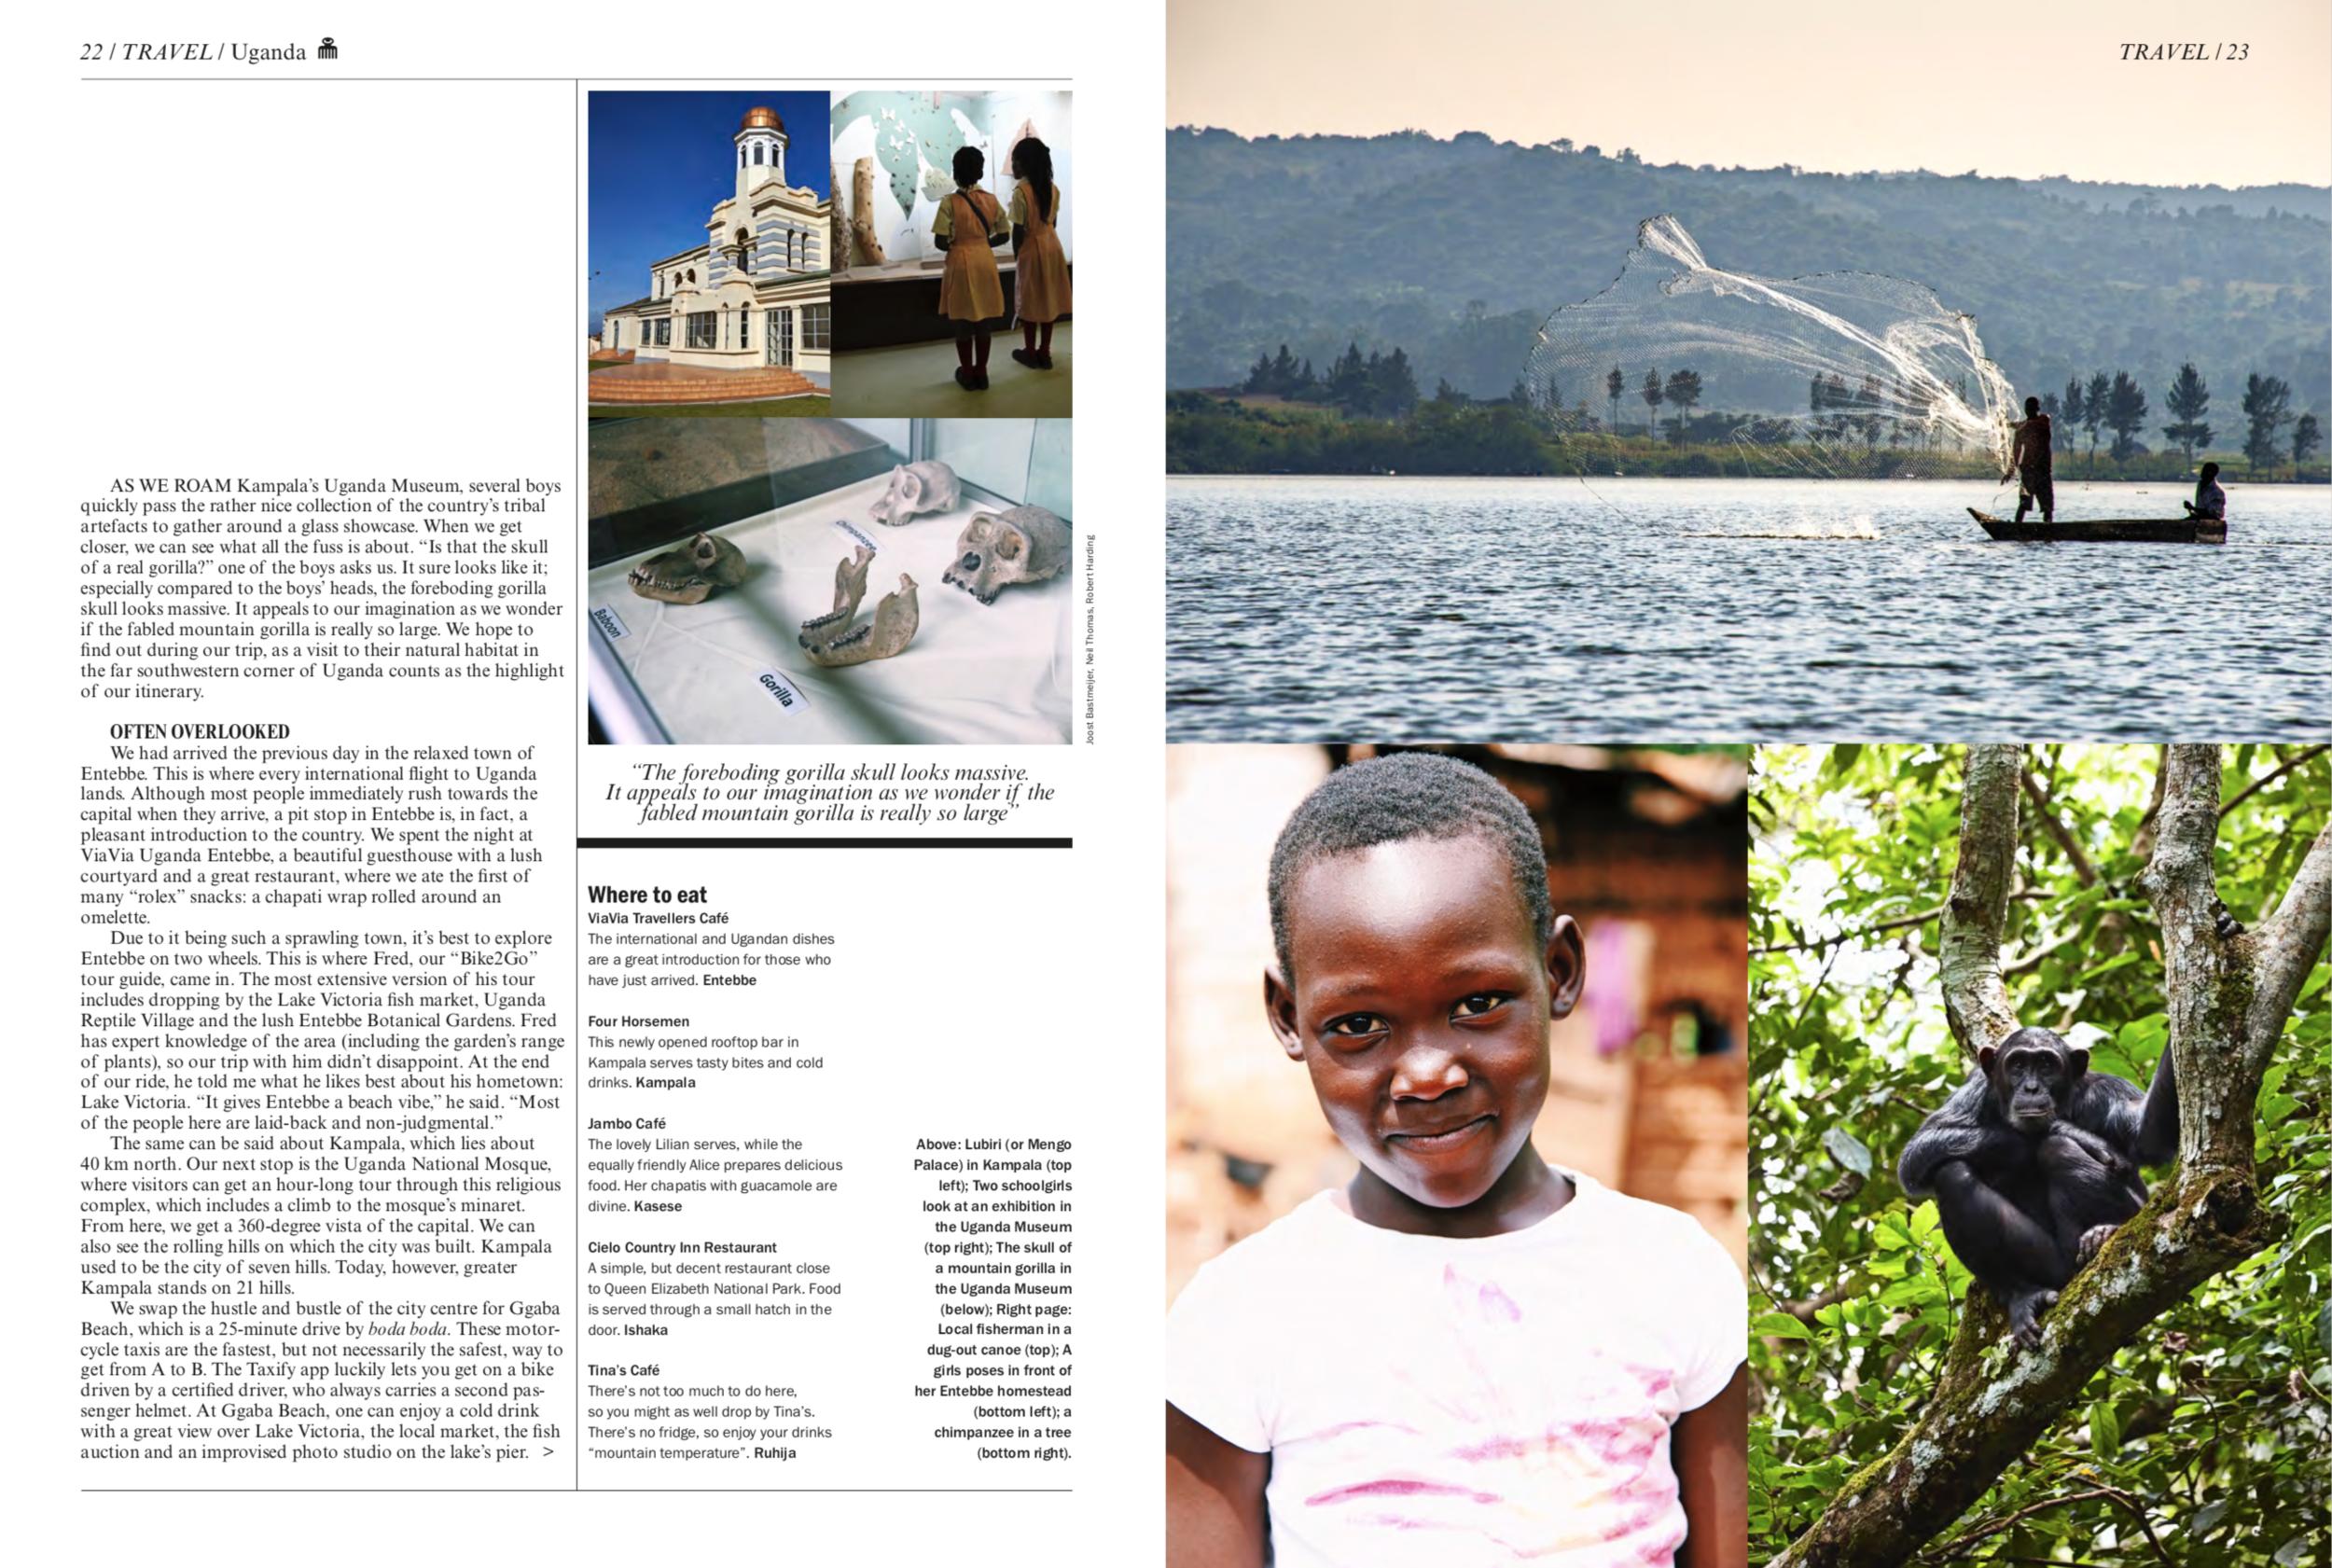 Msafiri Magazine Joost Bastmeijer Uganda travel story 2.png